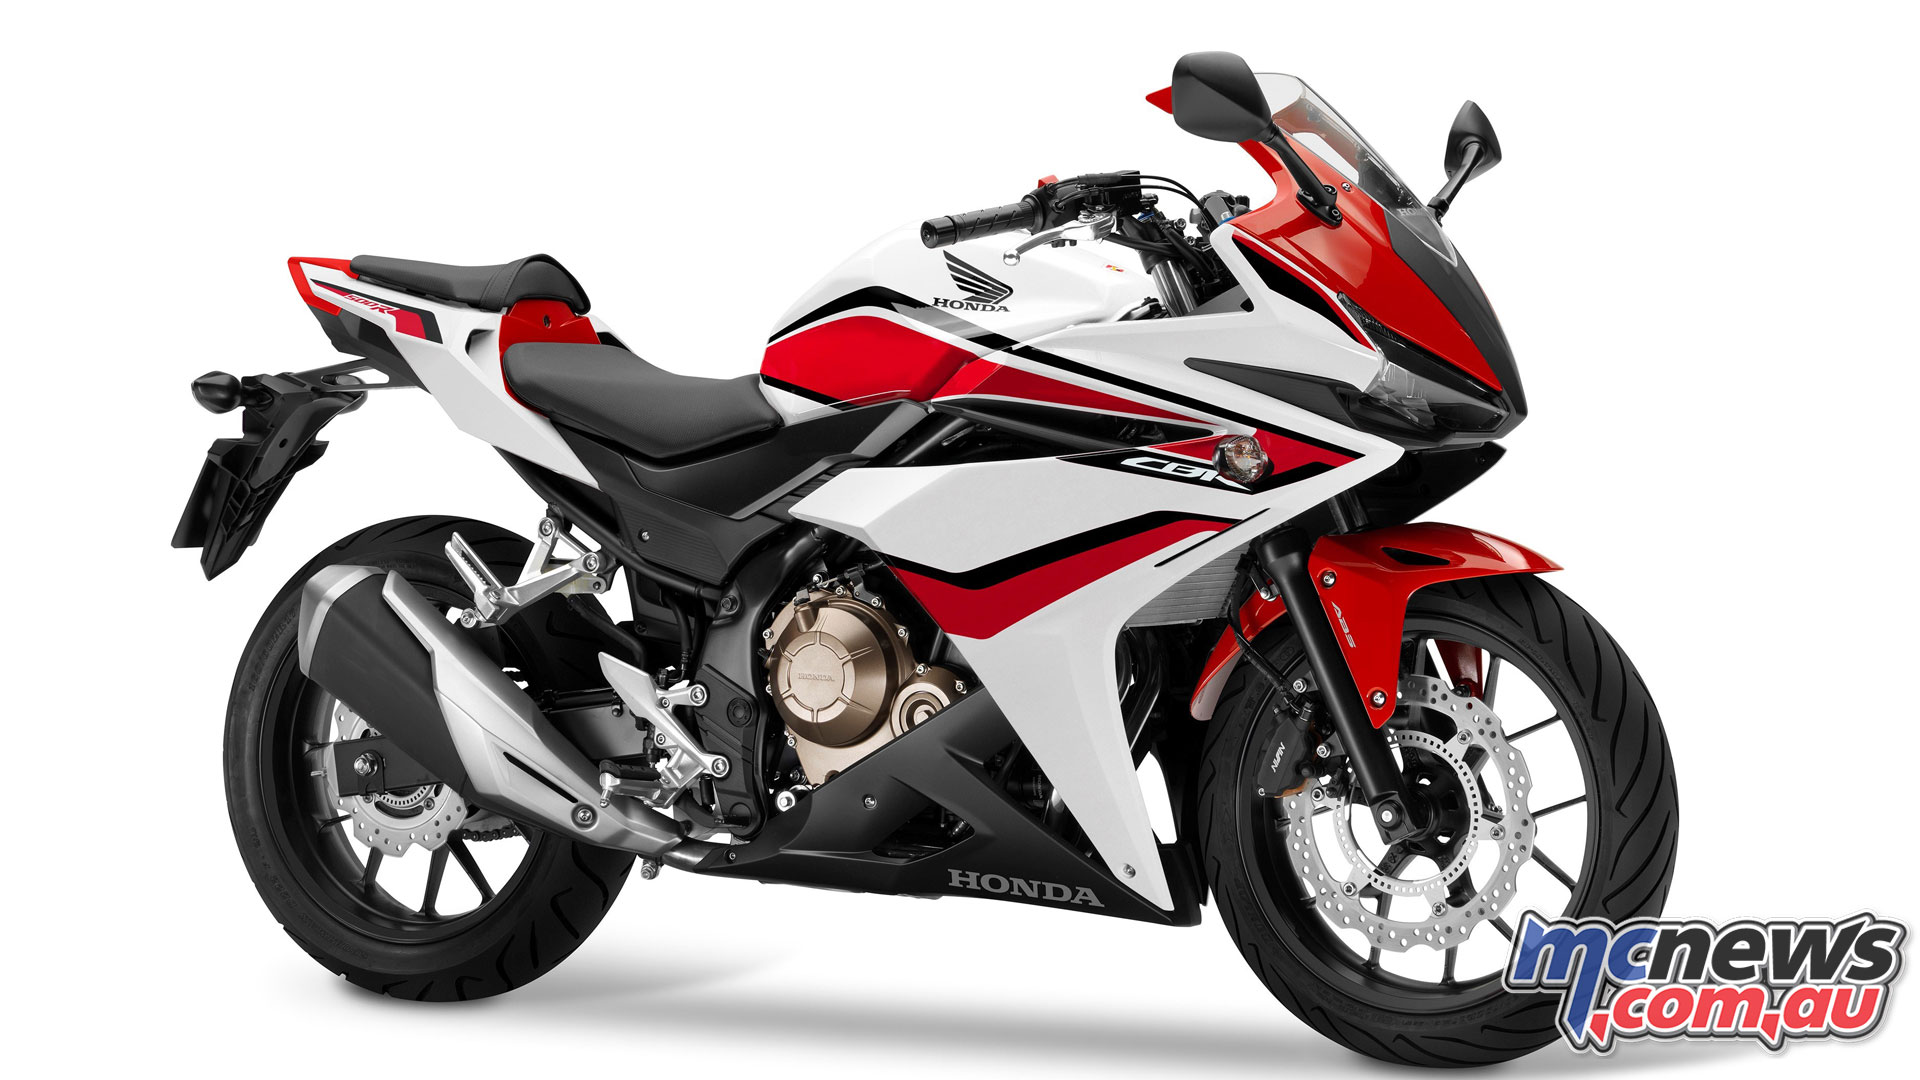 2018 Honda CBR500R now available from $7,699 | MCNews.com.au